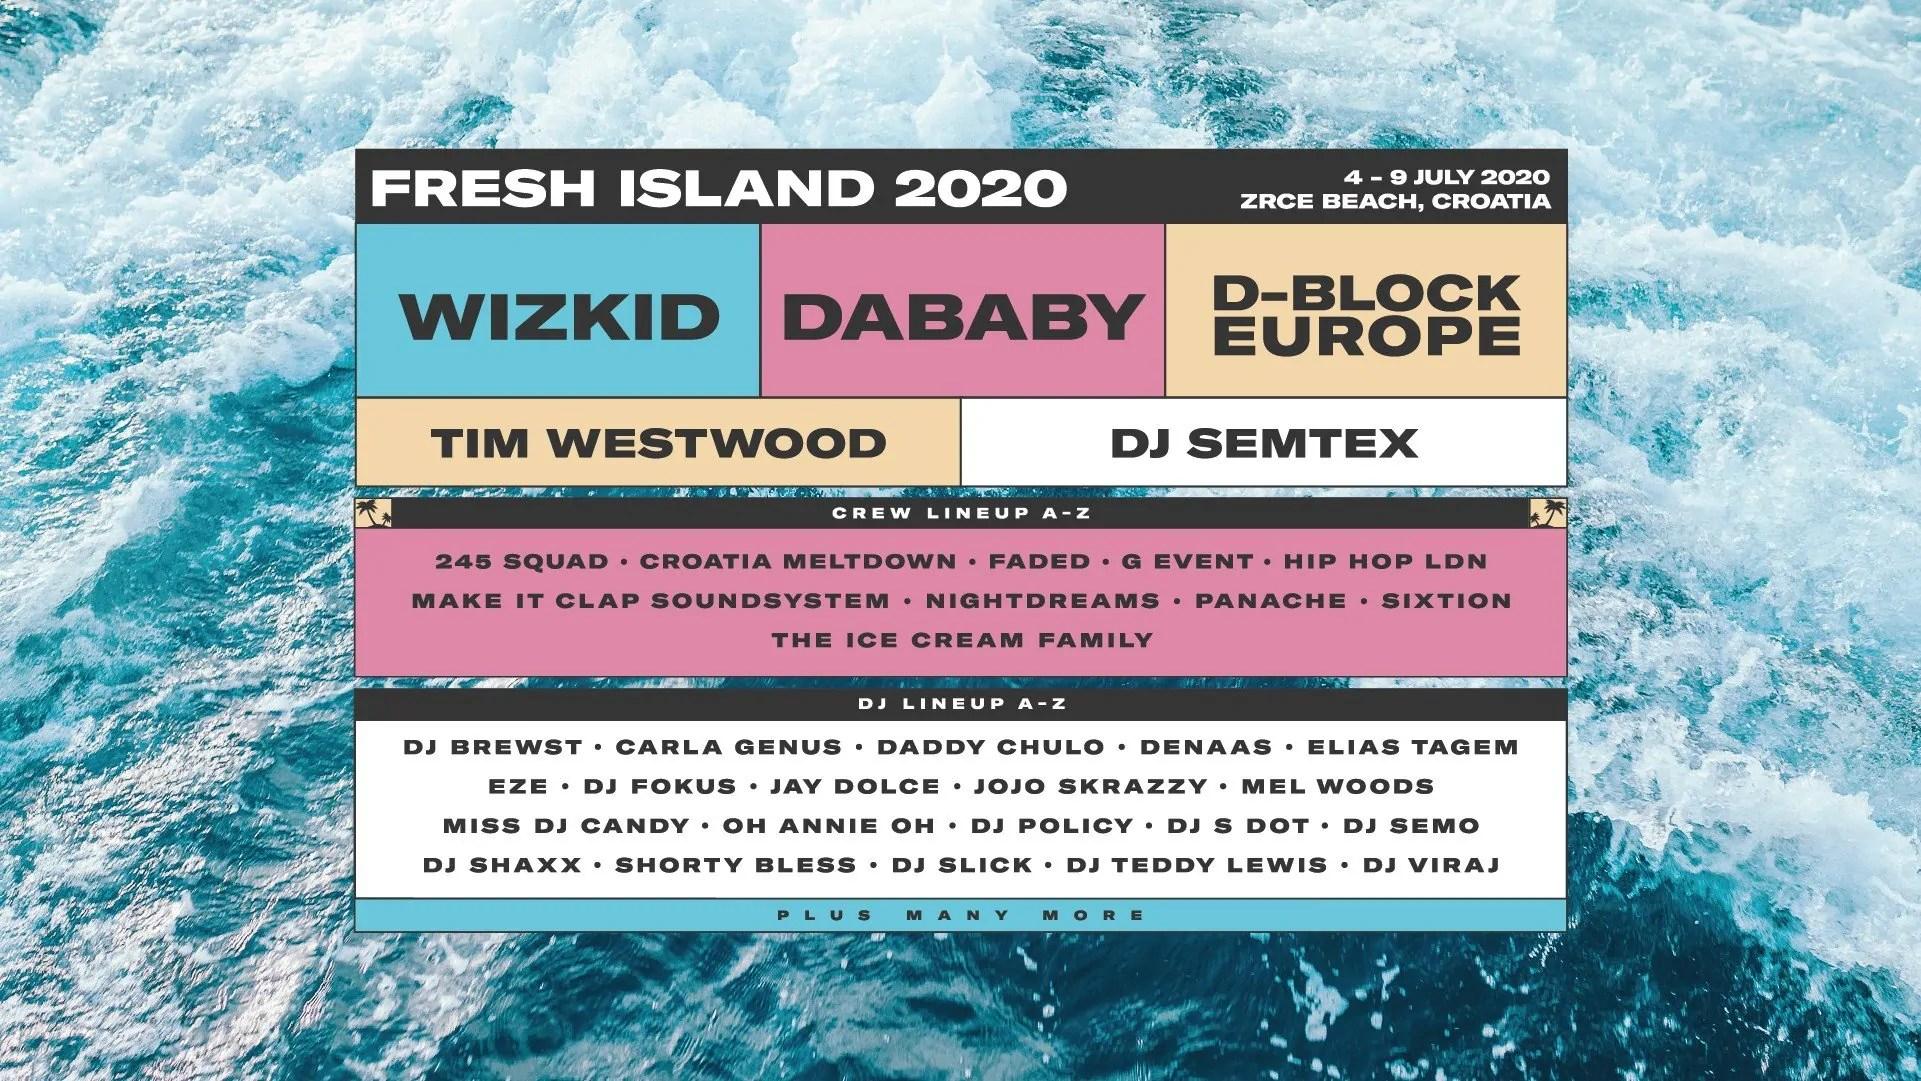 Fresh Island 2020, Zrce Beach Novalja Pag 04 – 11 Luglio Croazia